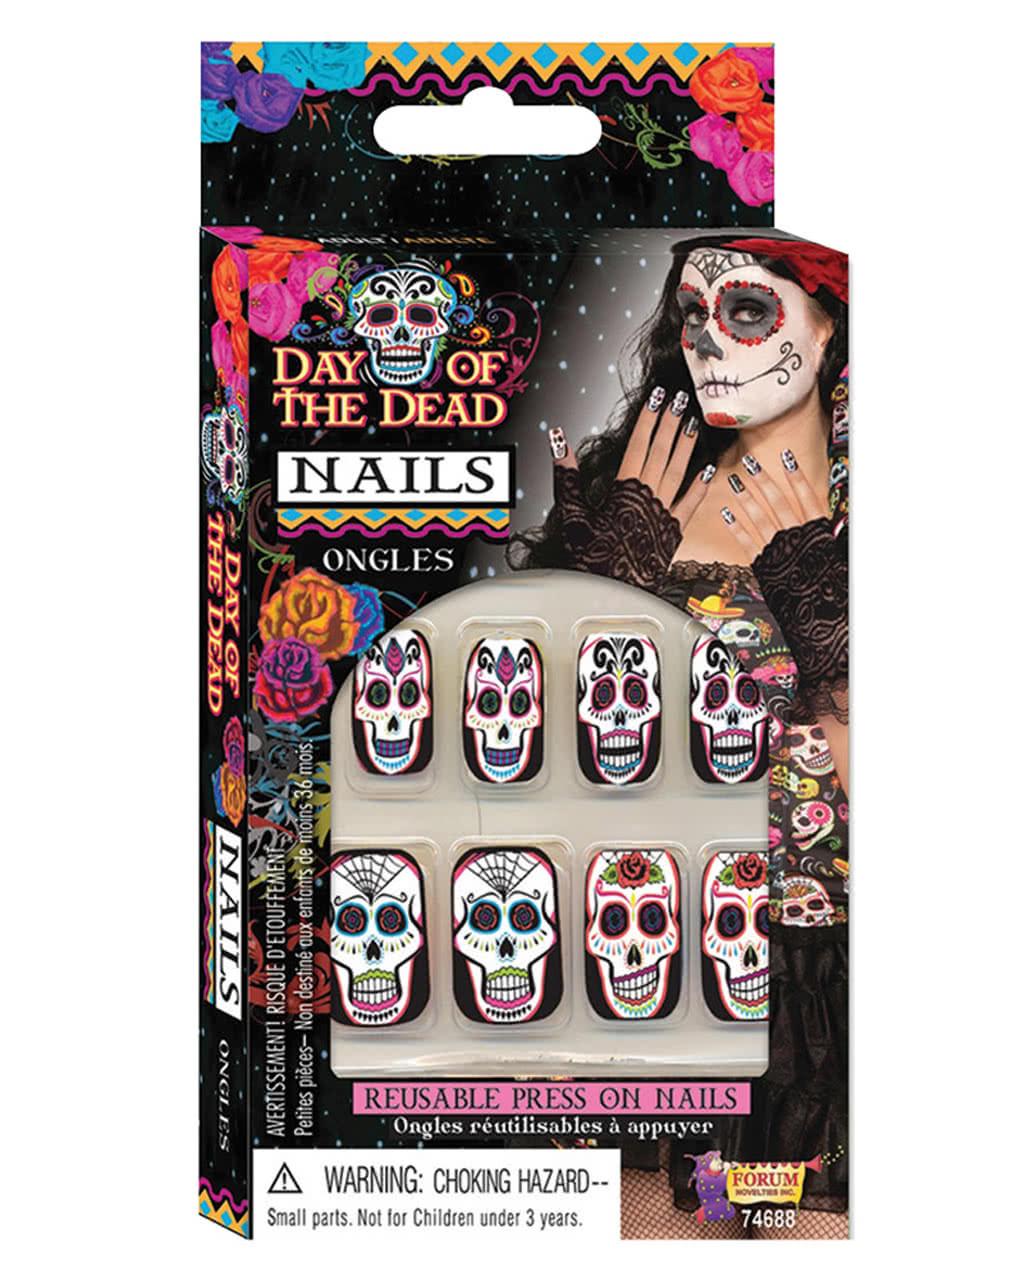 Sugar Skull Fingernägel | Day of the Dead Nails | Karneval Universe